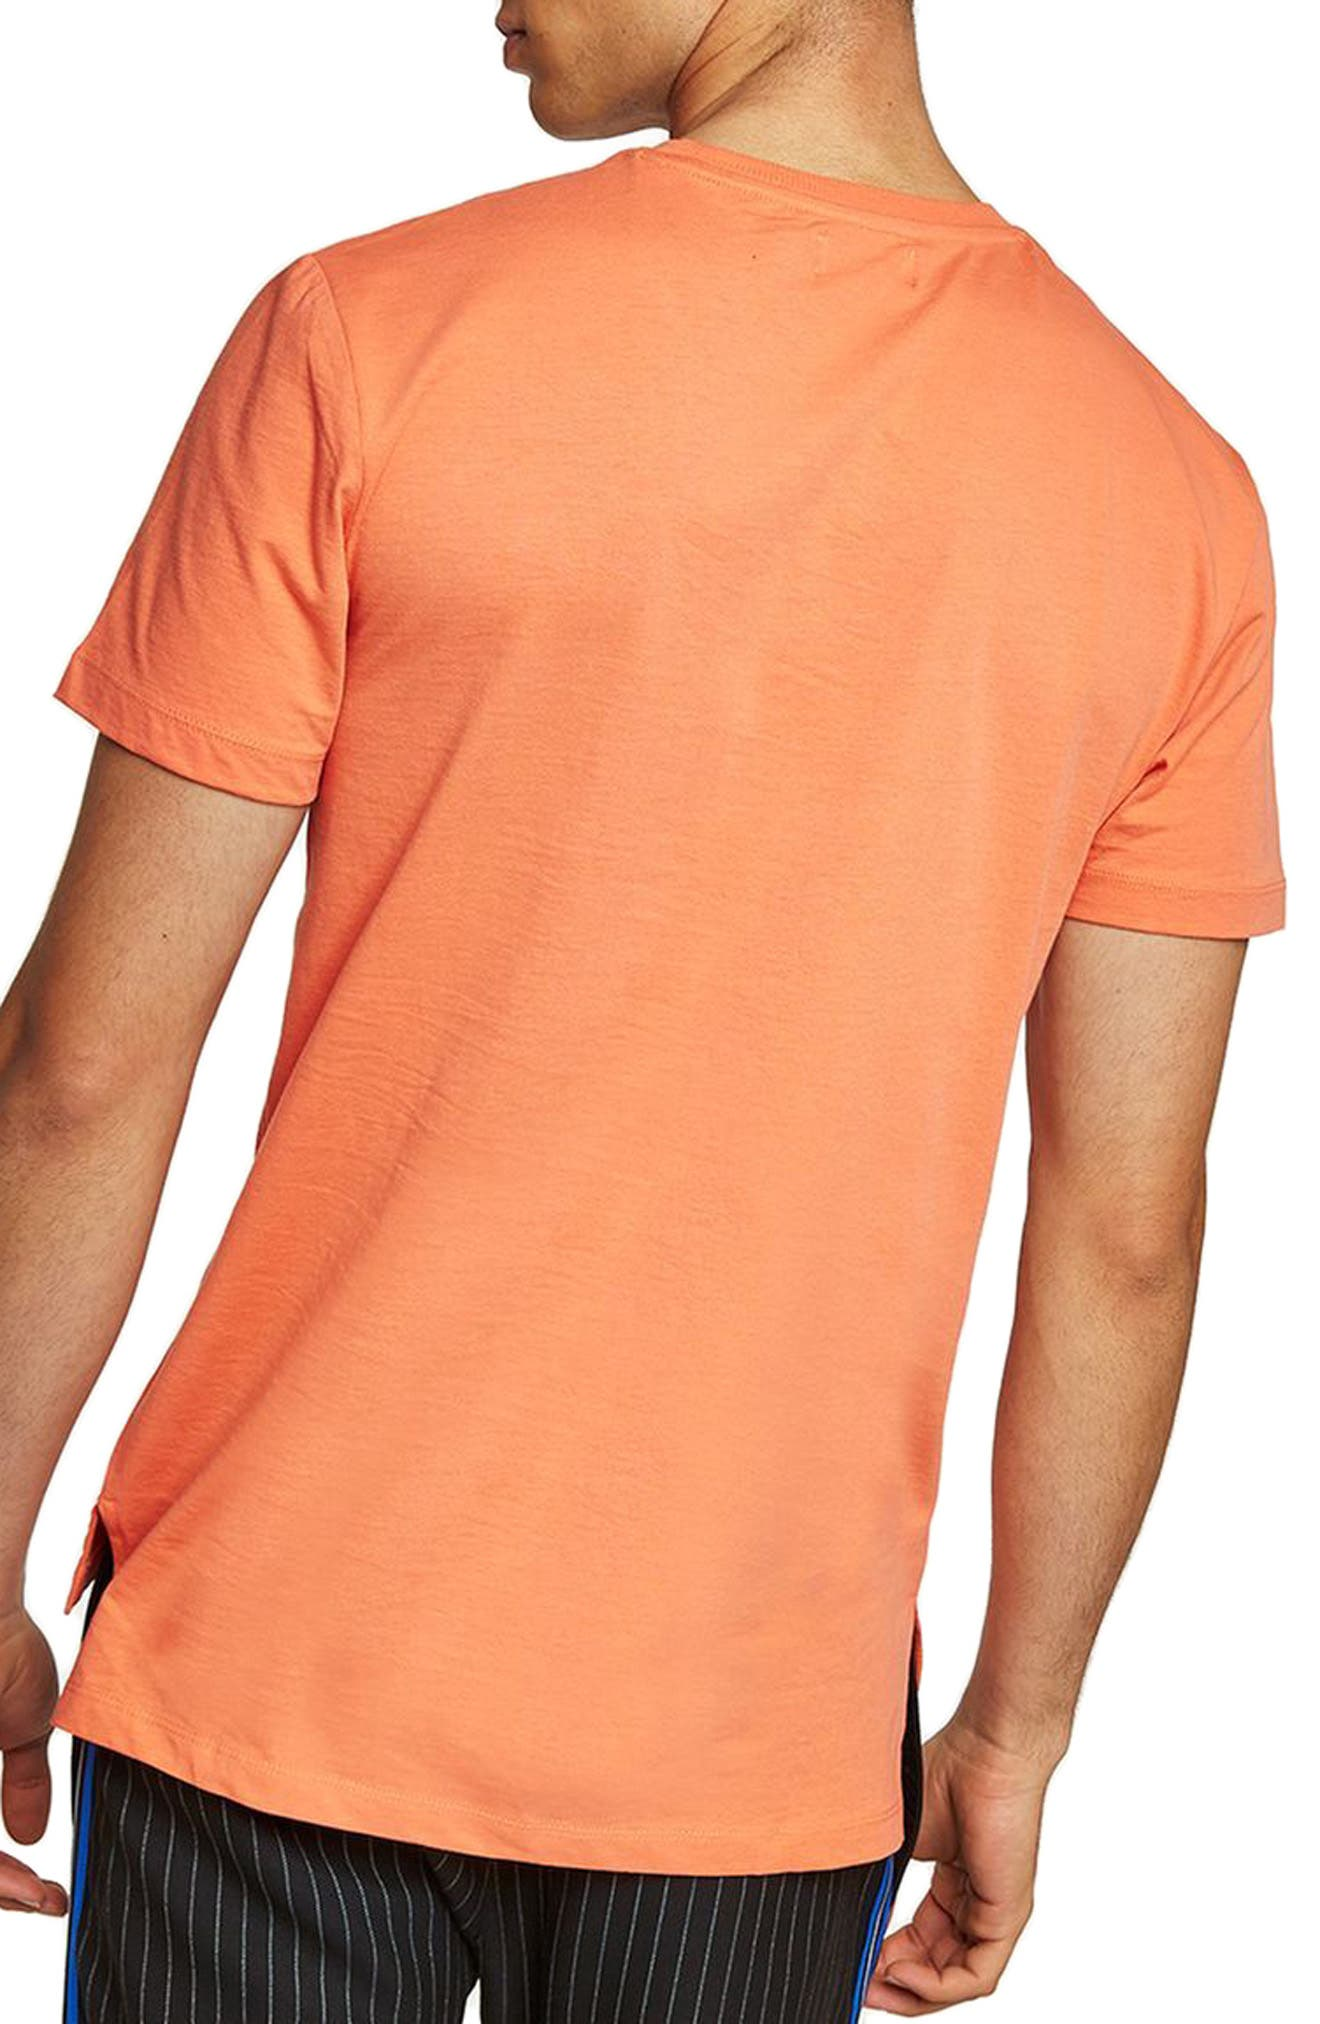 Ensign Graphic T-Shirt,                             Main thumbnail 1, color,                             950